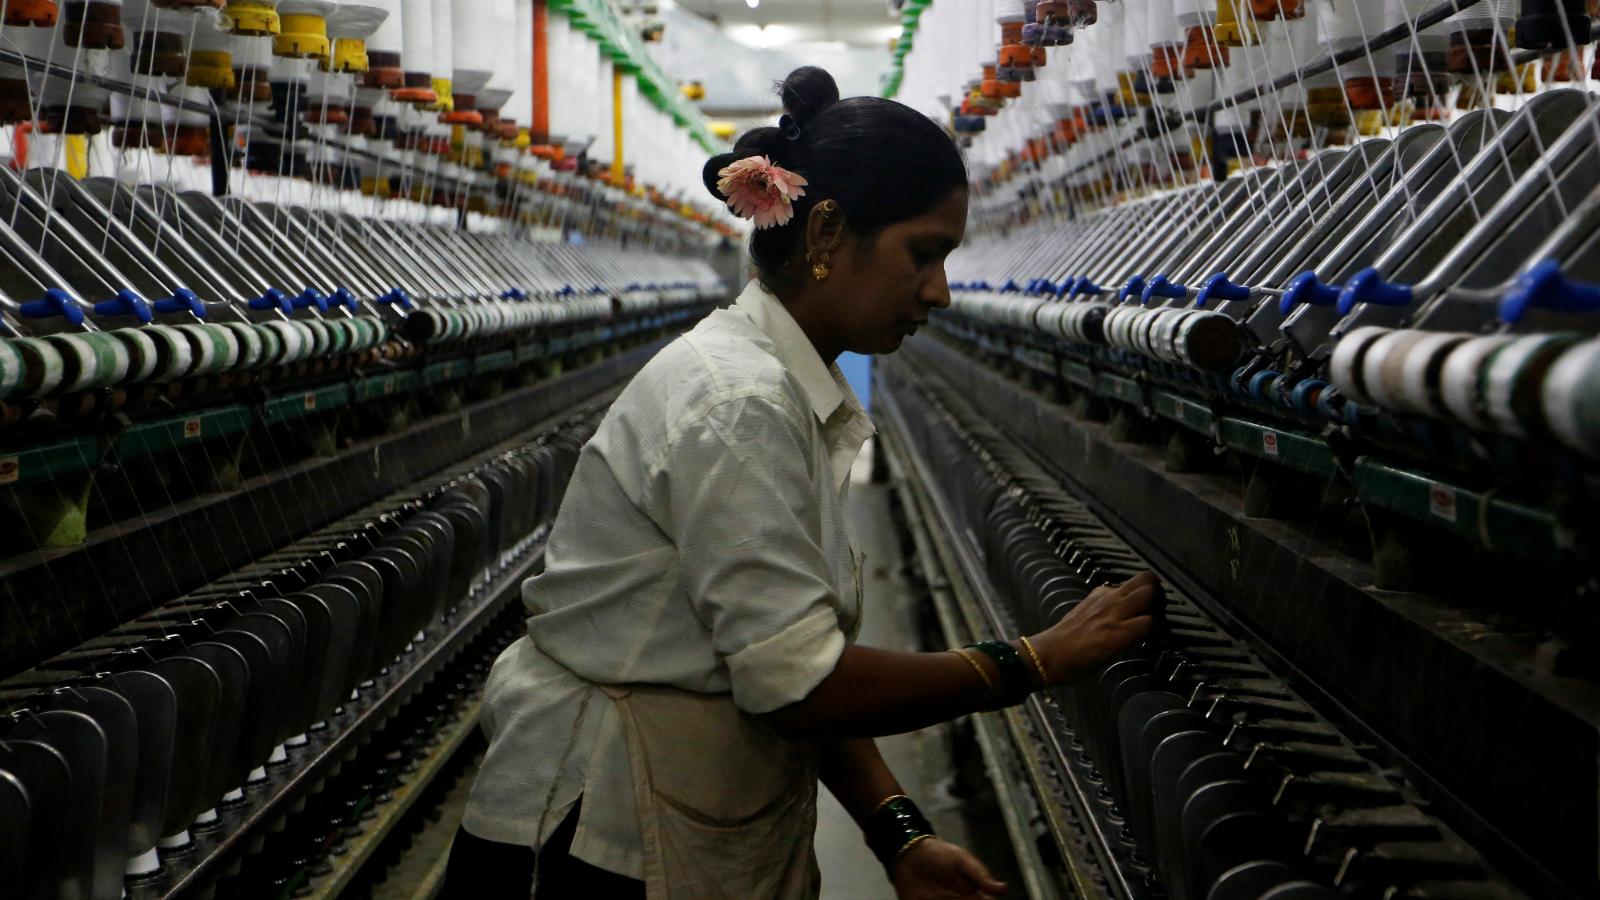 India's rising wealth isn't reaching women, says Credit Suisse